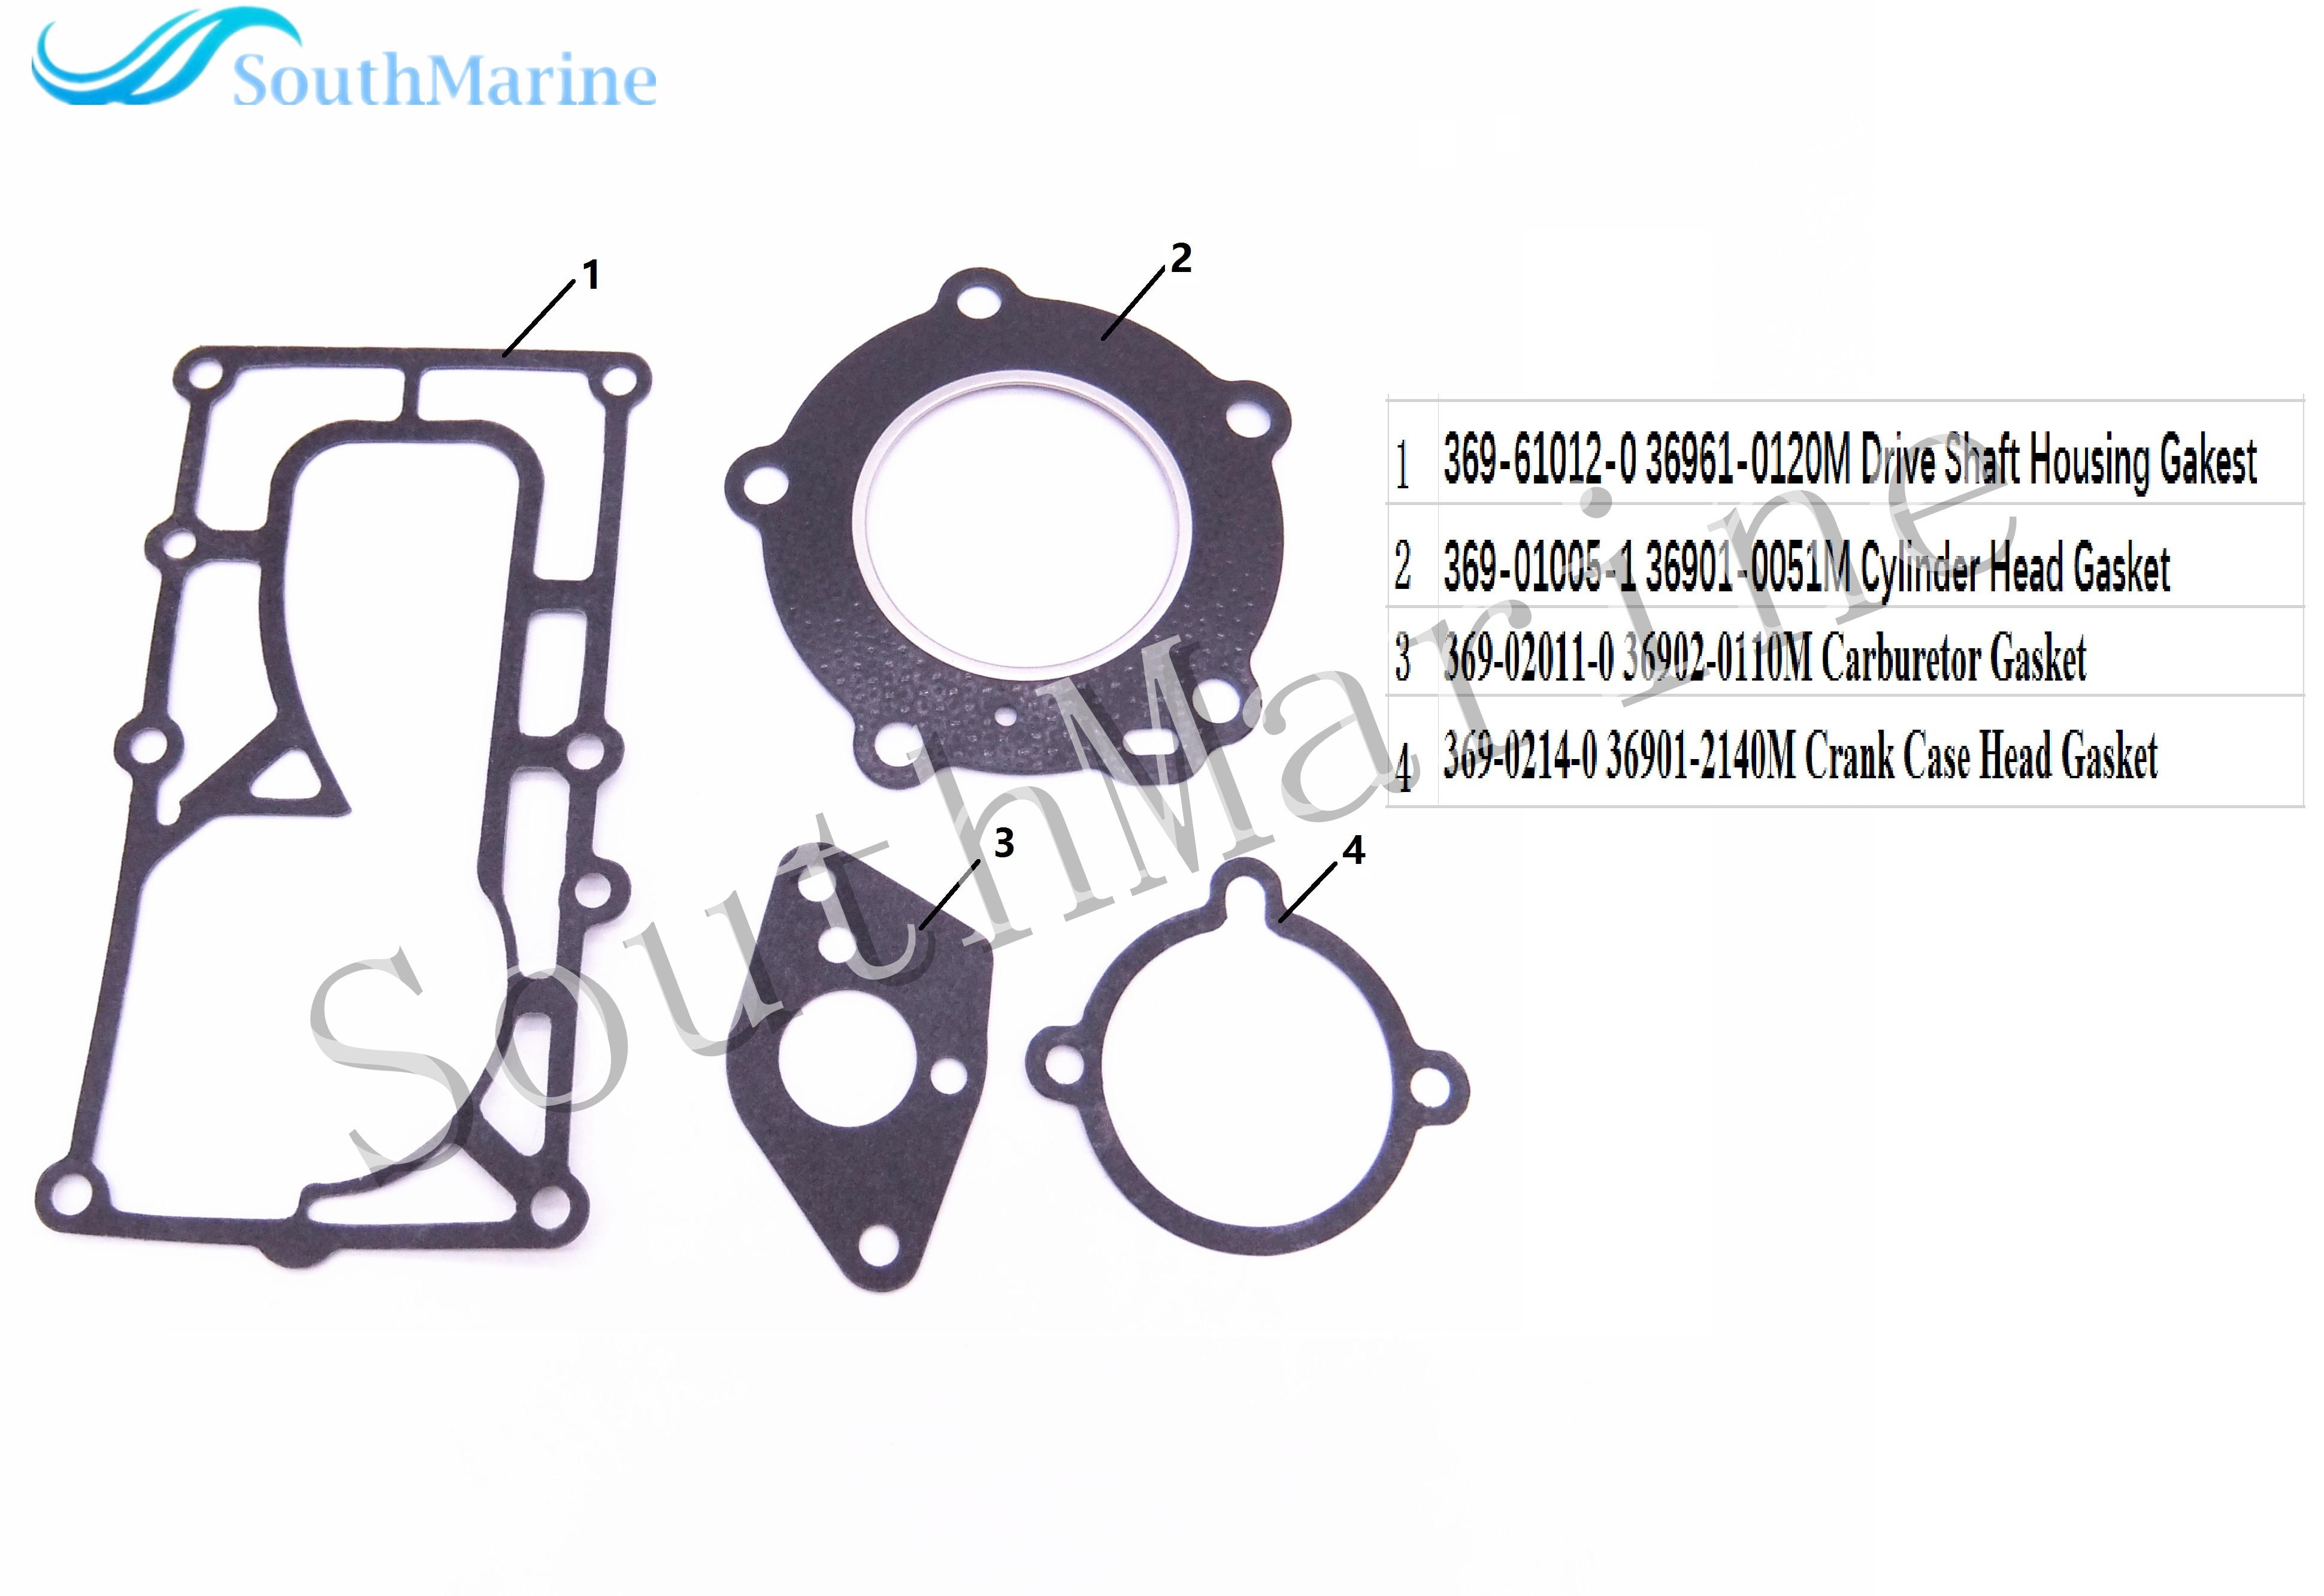 Yamaha Hp Outboard Motor Wiring Diagram on 40 hp tohatsu wiring diagram, 40 hp yamaha outboard motor, 40 hp johnson wiring diagram, 40 hp mariner wiring diagram, mercury outboard 50 hp 2 stroke diagram, 40 hp honda wiring diagram,